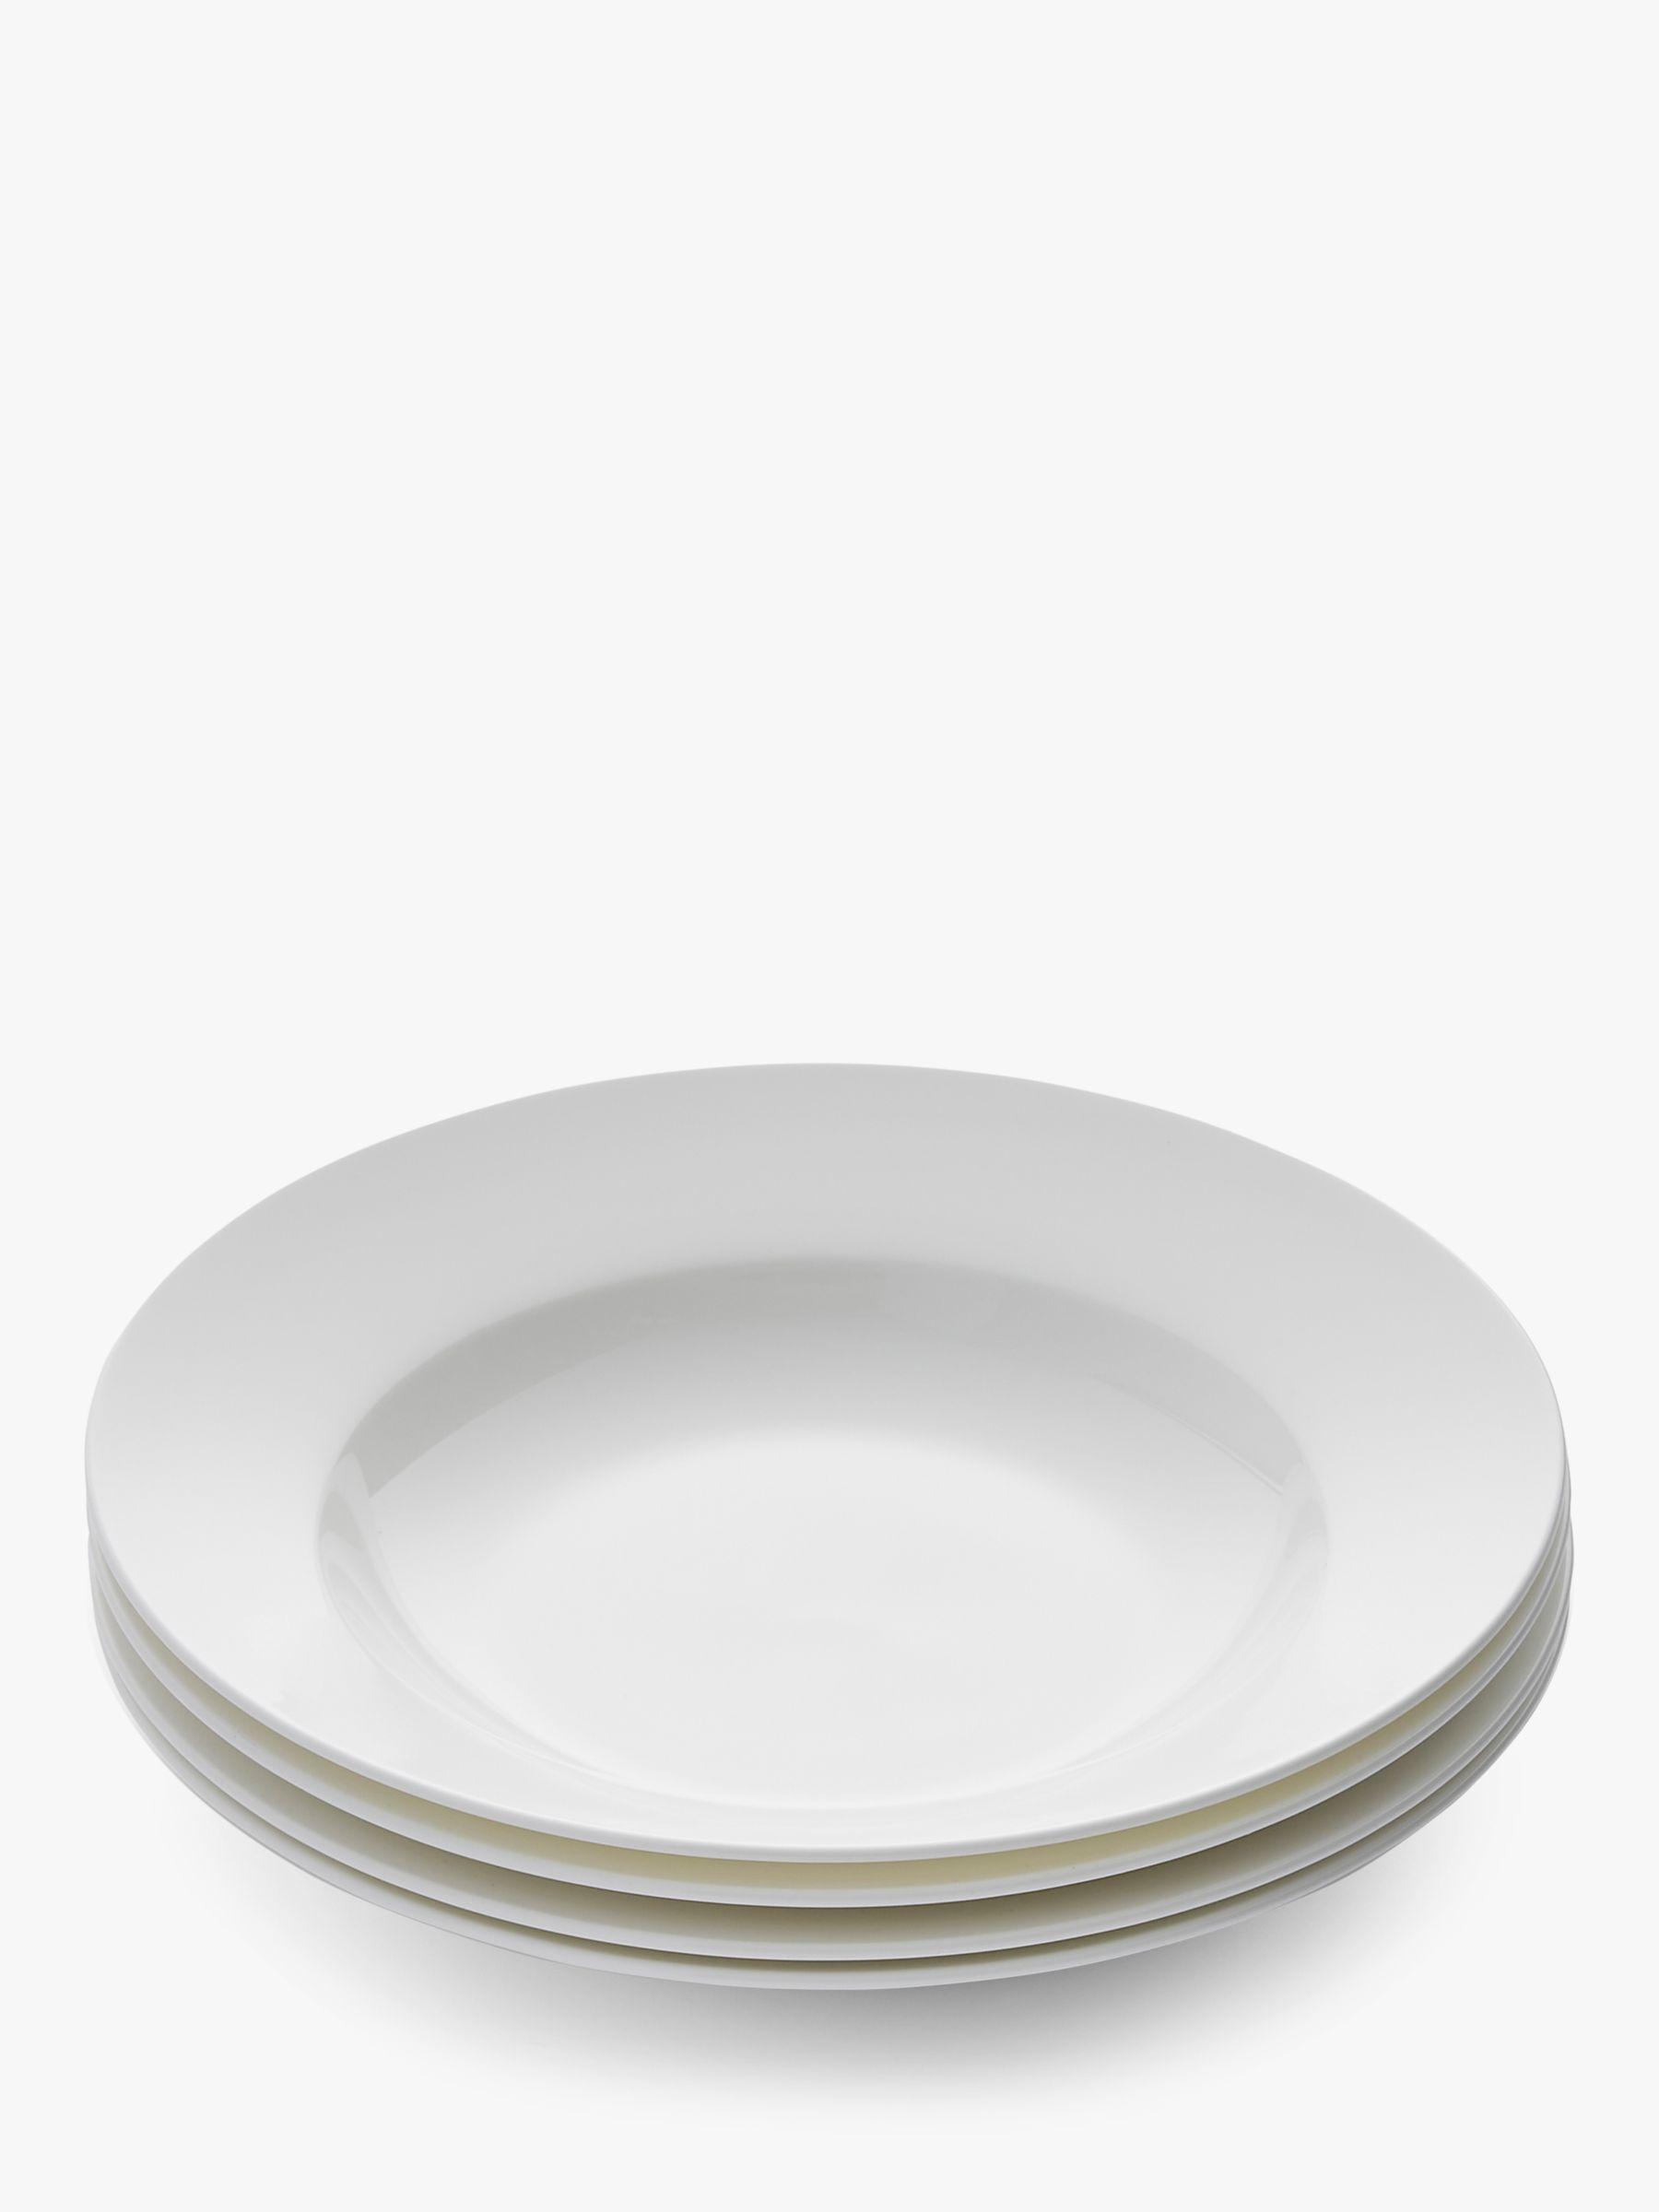 Royal Worcester Royal Worcester Serendipity Bone China Soup Bowls, 24cm, Set of 4, White